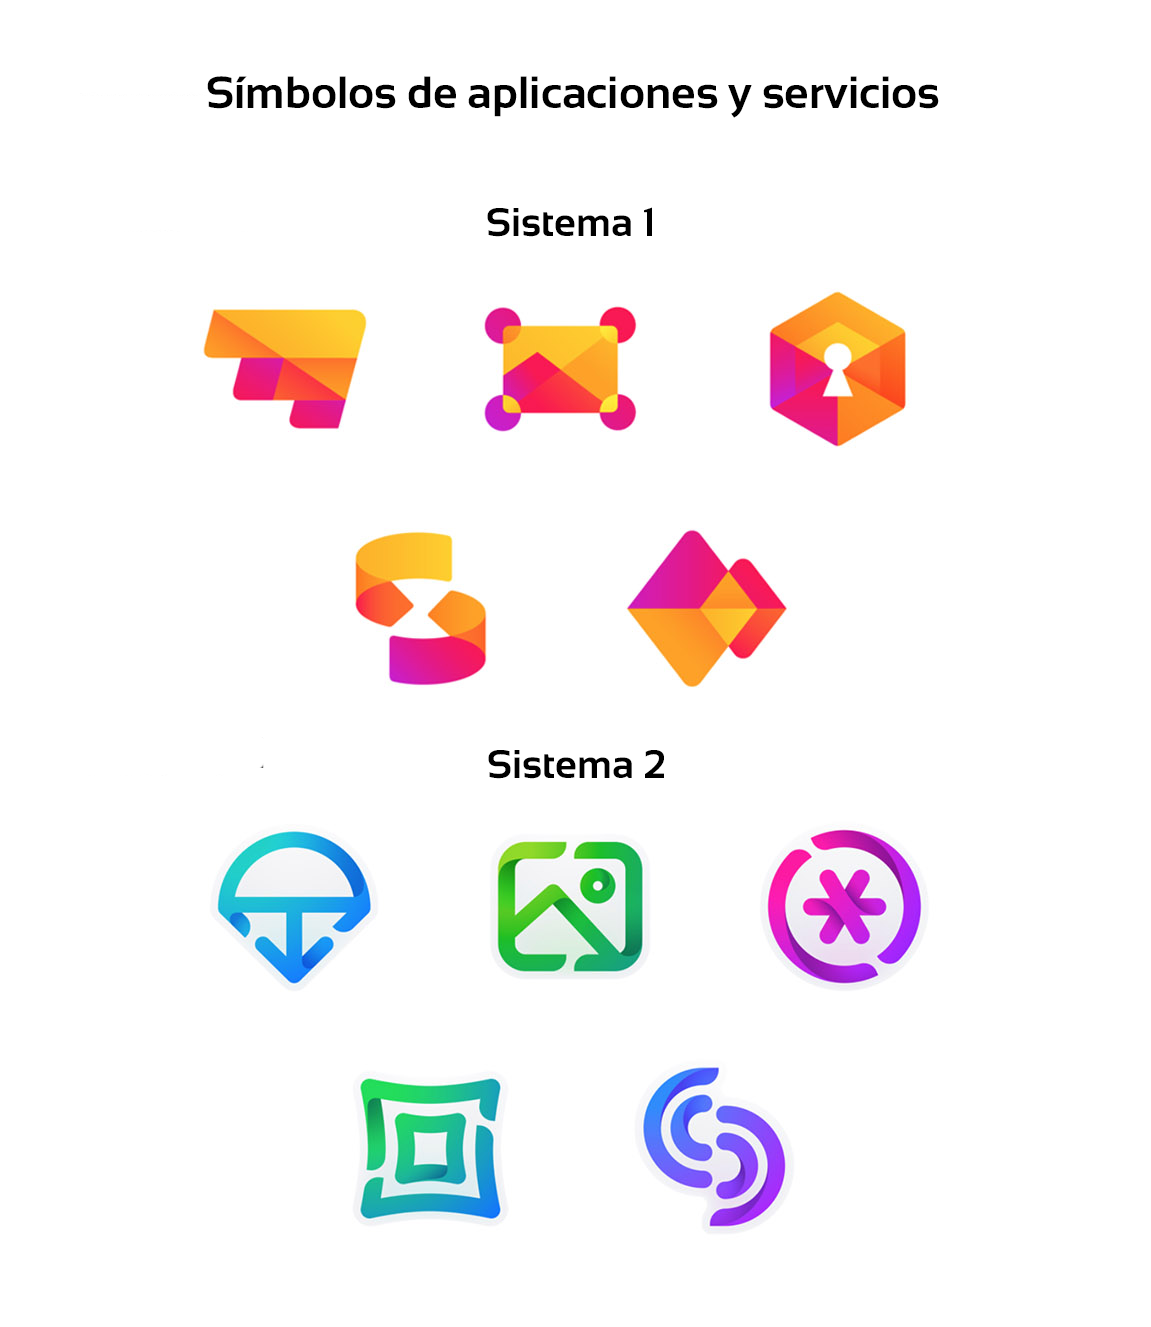 mozilla-nueva-familia-de-logos-para-firefox-2018